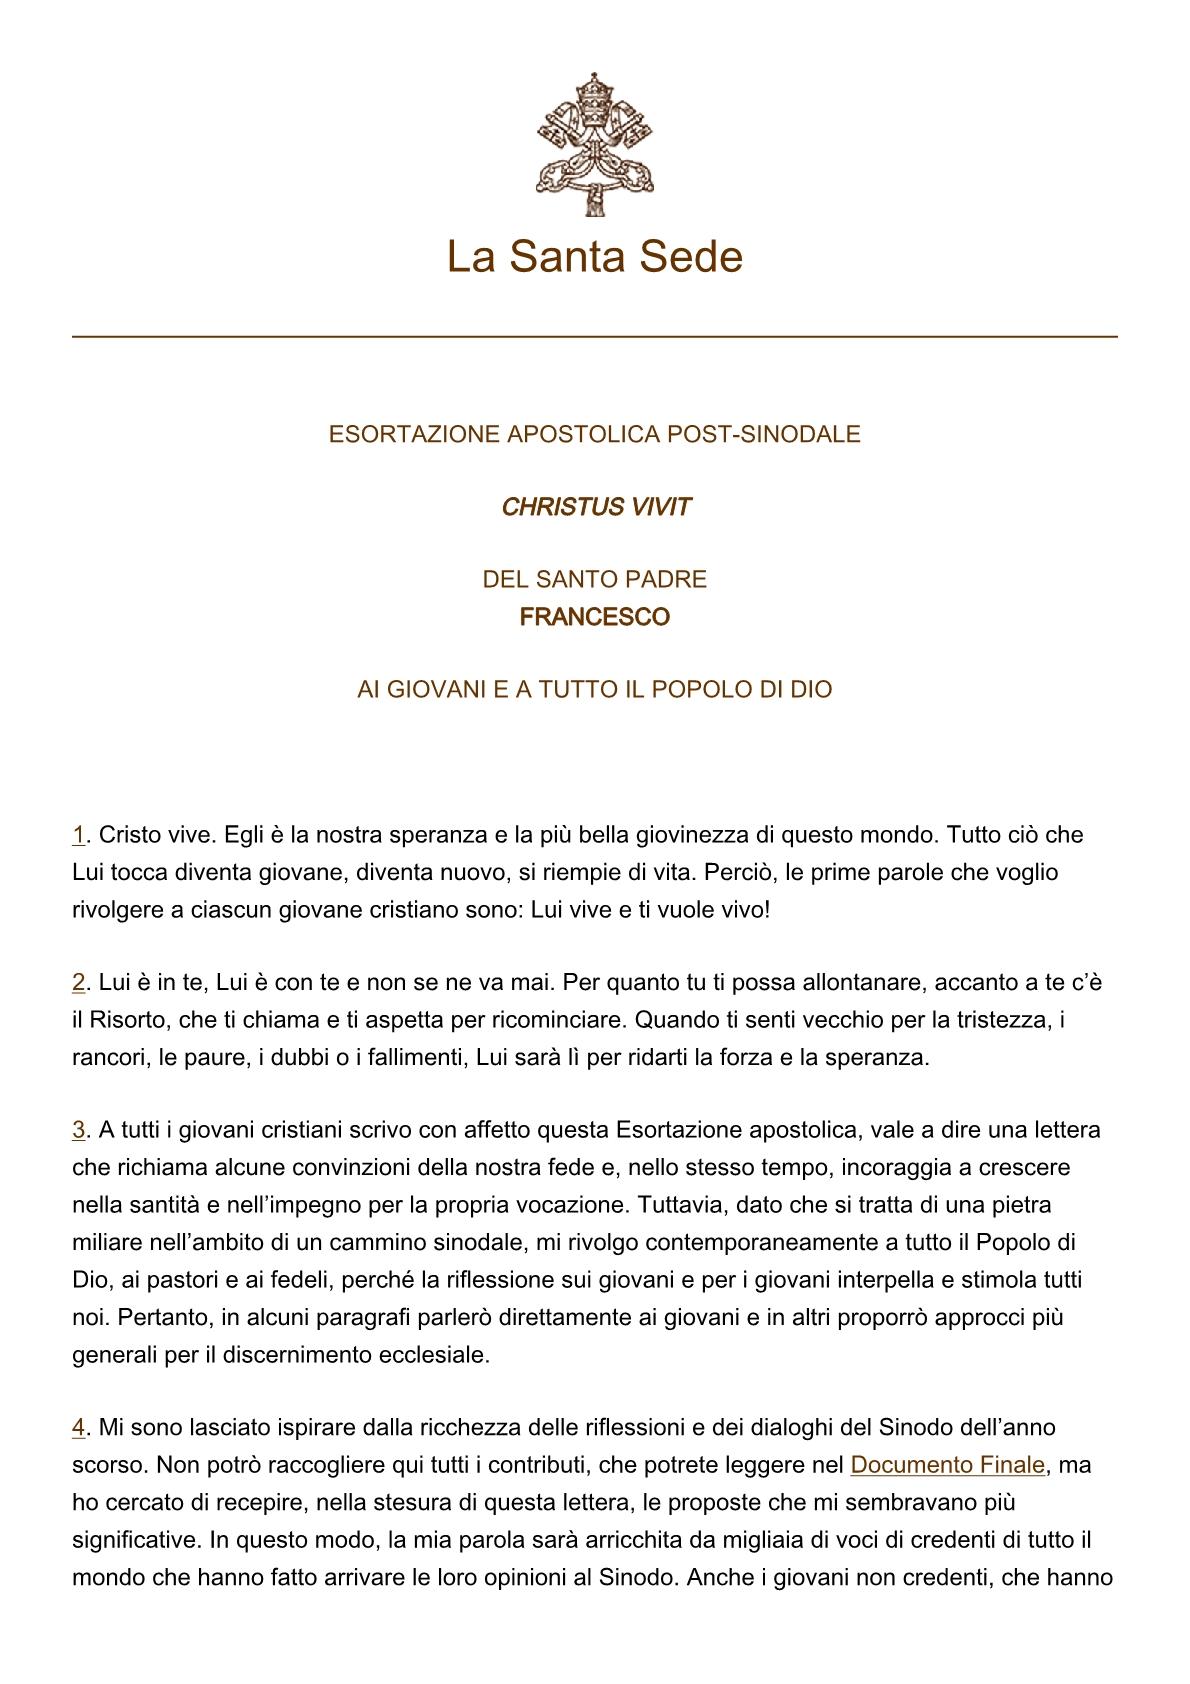 papa-francesco_esortazione-ap_20190325_christus-vivit1